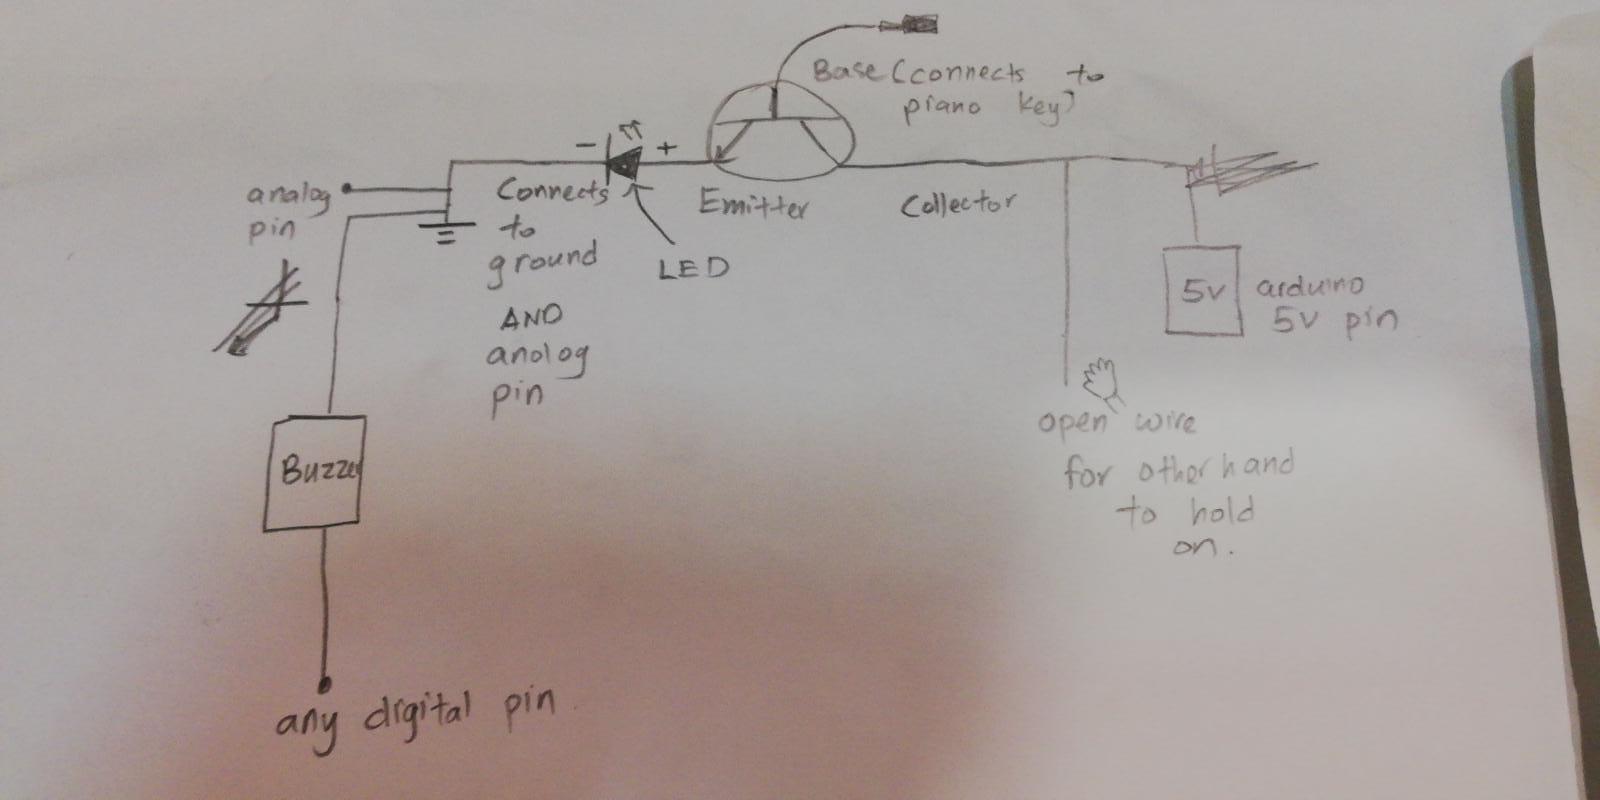 Touch Sensing Paper Piano How To Build Simple Capacitive Sensor Circuit Diagram Whatsapp Image 2018 11 18 At 20 57 39 Lbsycs7wi4